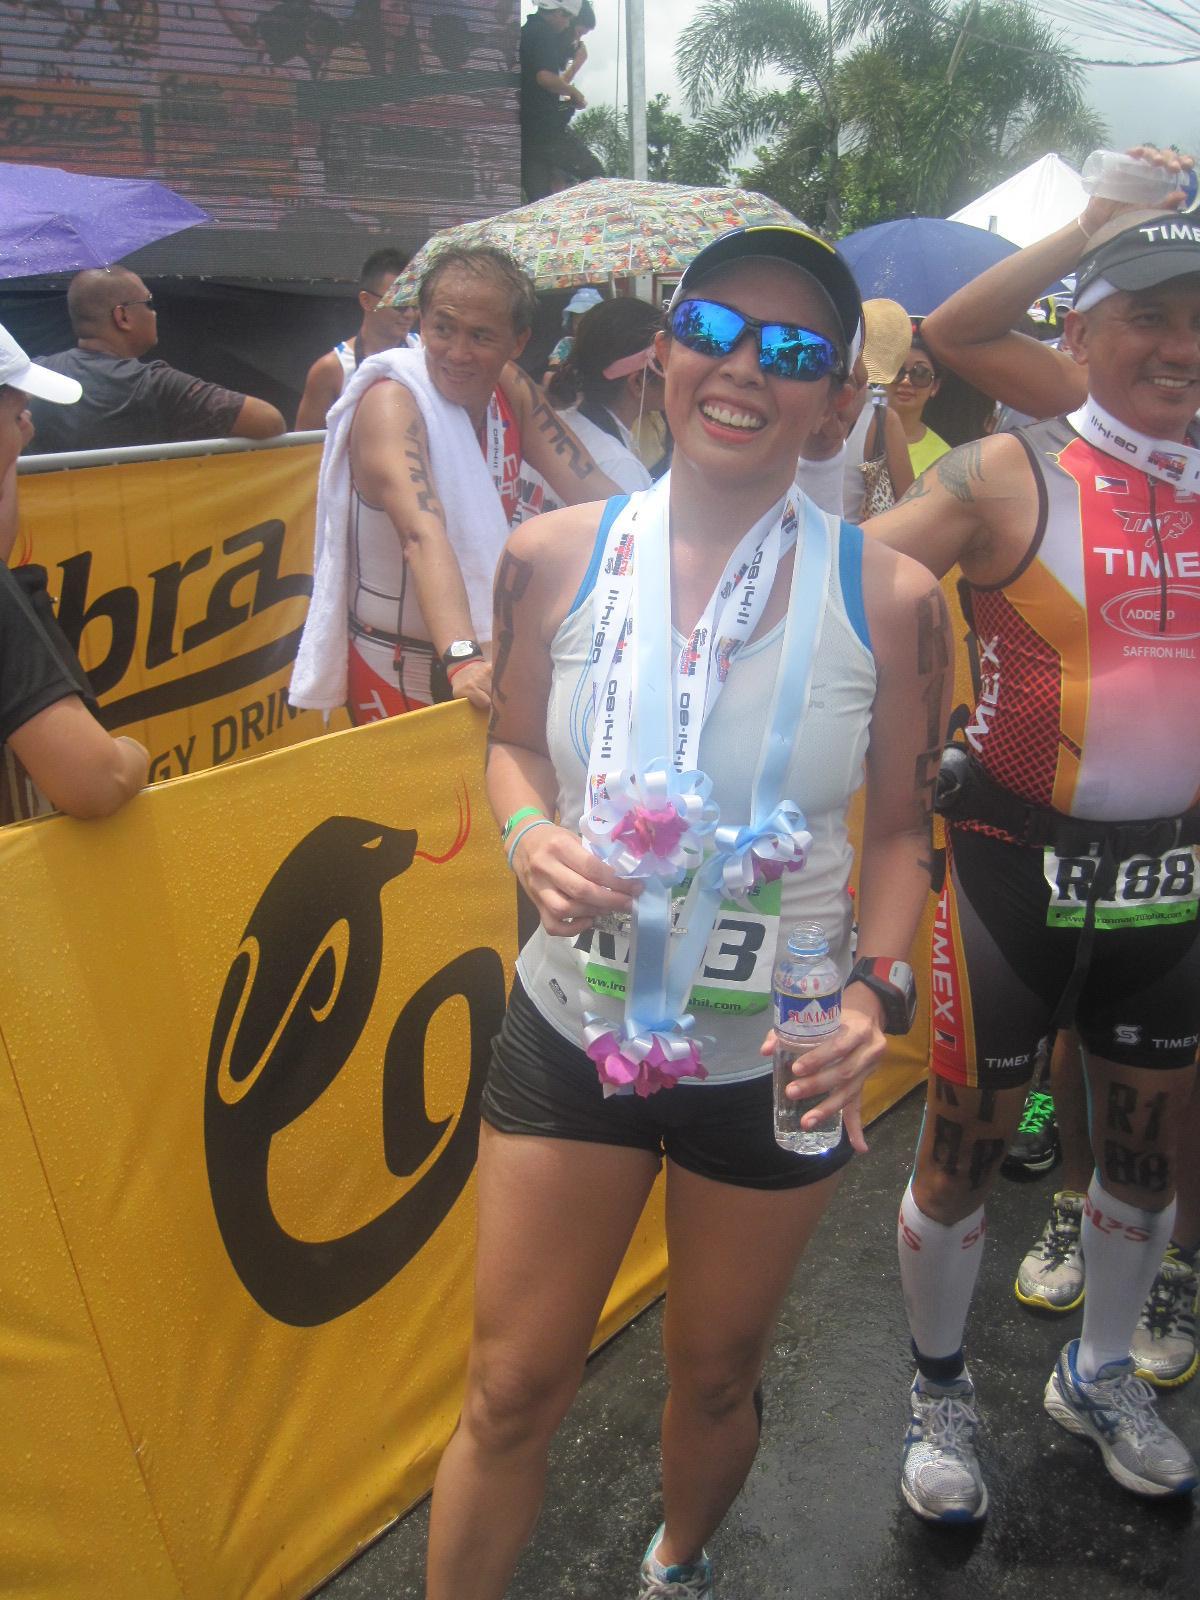 2011 Ironman 70.3: Relay Finisher!